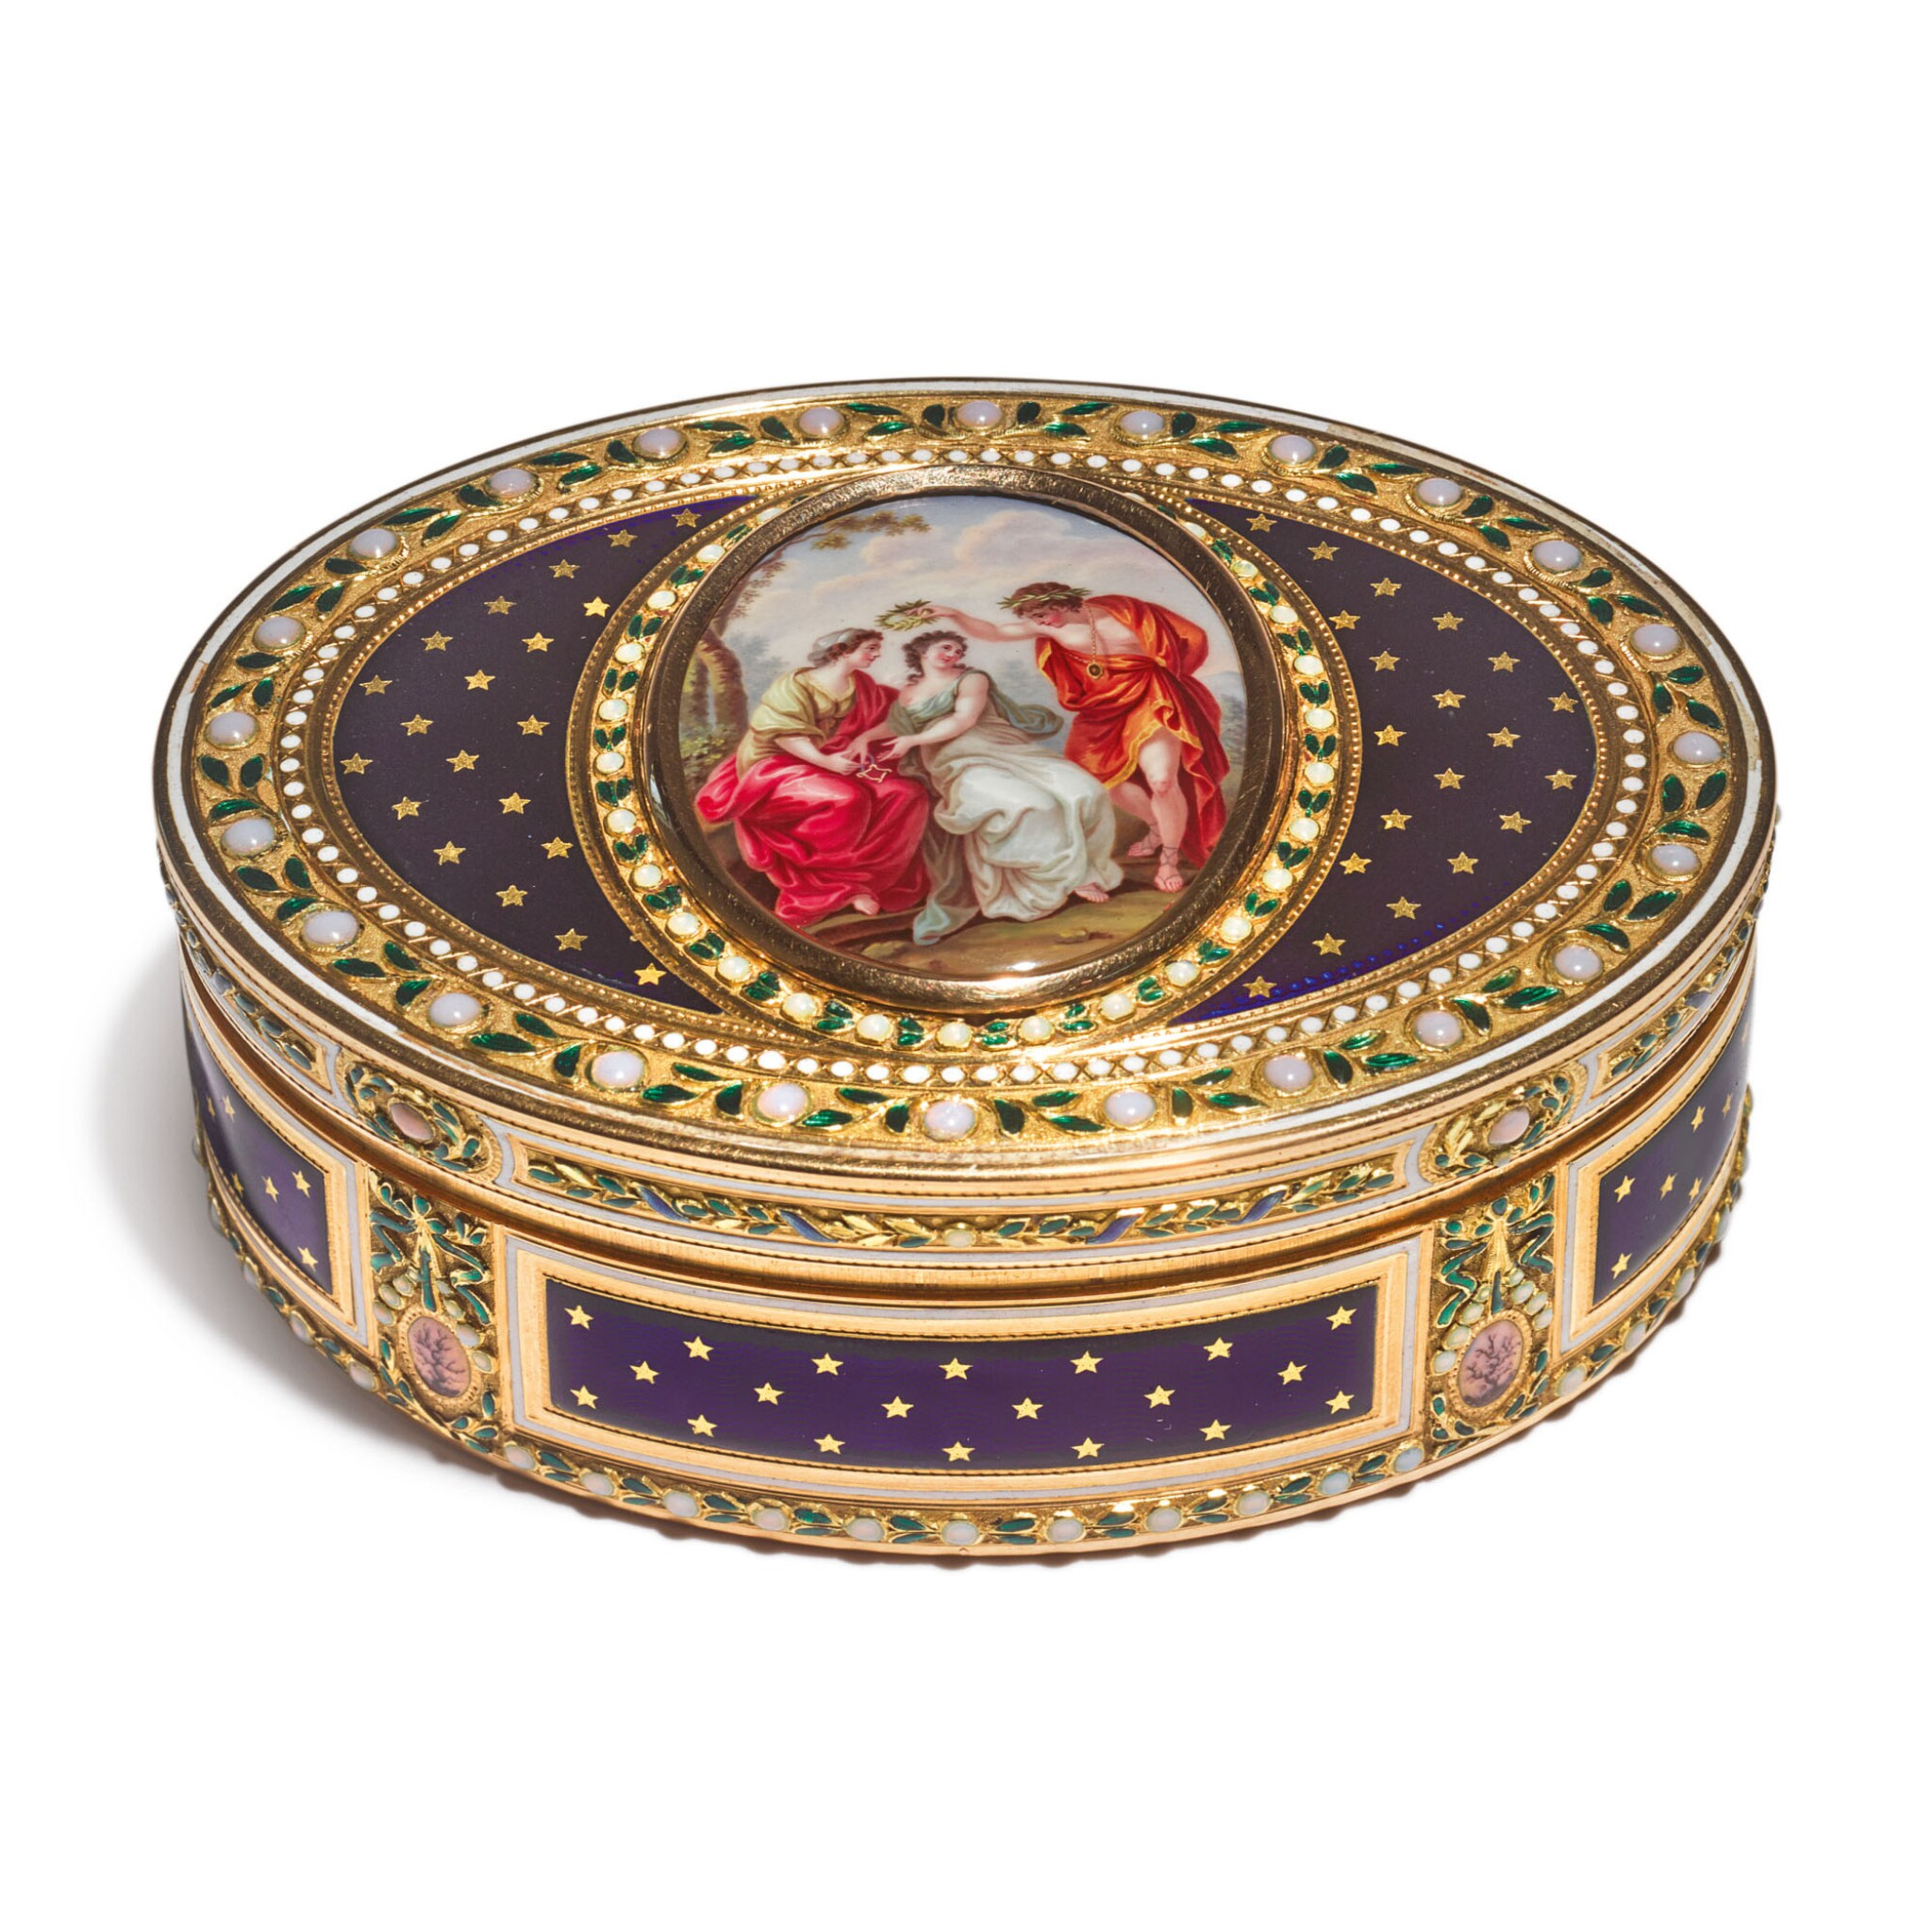 A LOUIS XVI ENAMELED GOLD OVAL SNUFF BOX, JOSEPH-ÉTIENNE BLERZY, PARIS, 1784